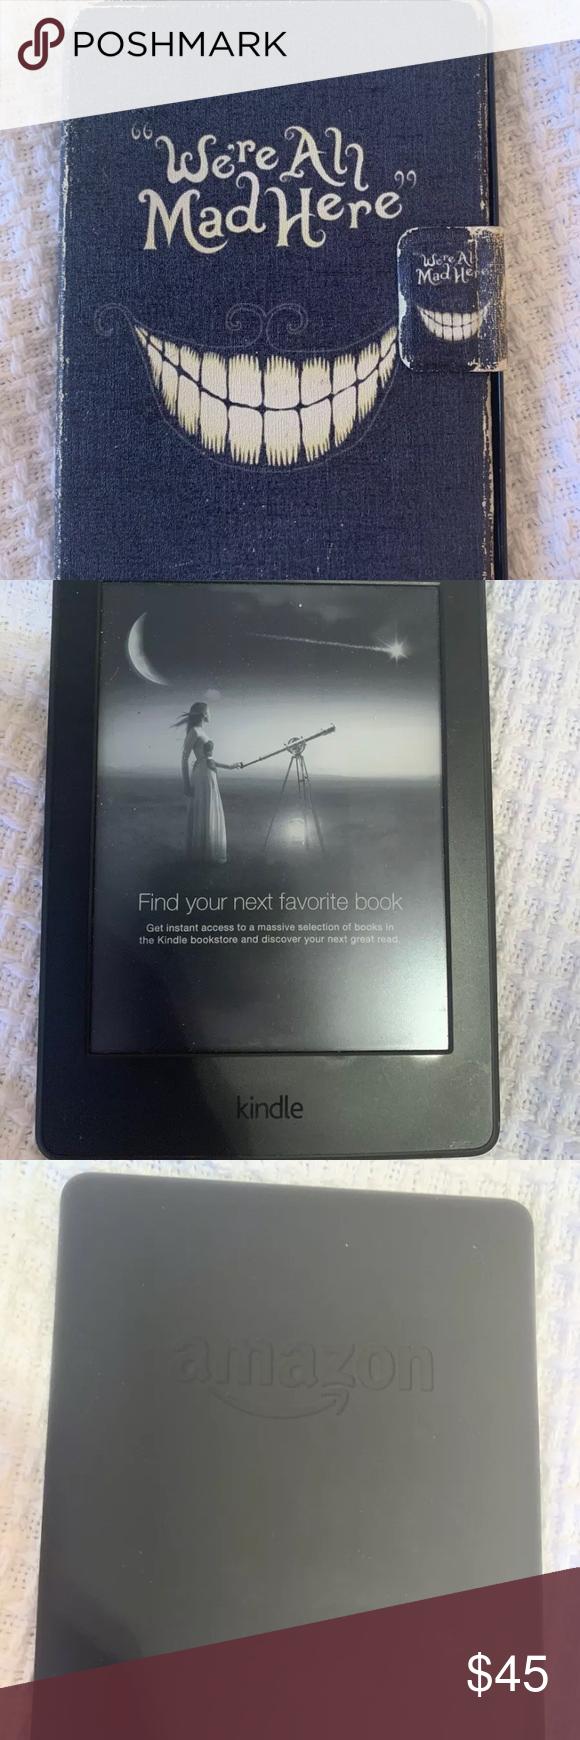 Case For Amazon Kindle Paperwhite Kindle Paperwhite Kindle Paperwhite Case Amazon Kindle